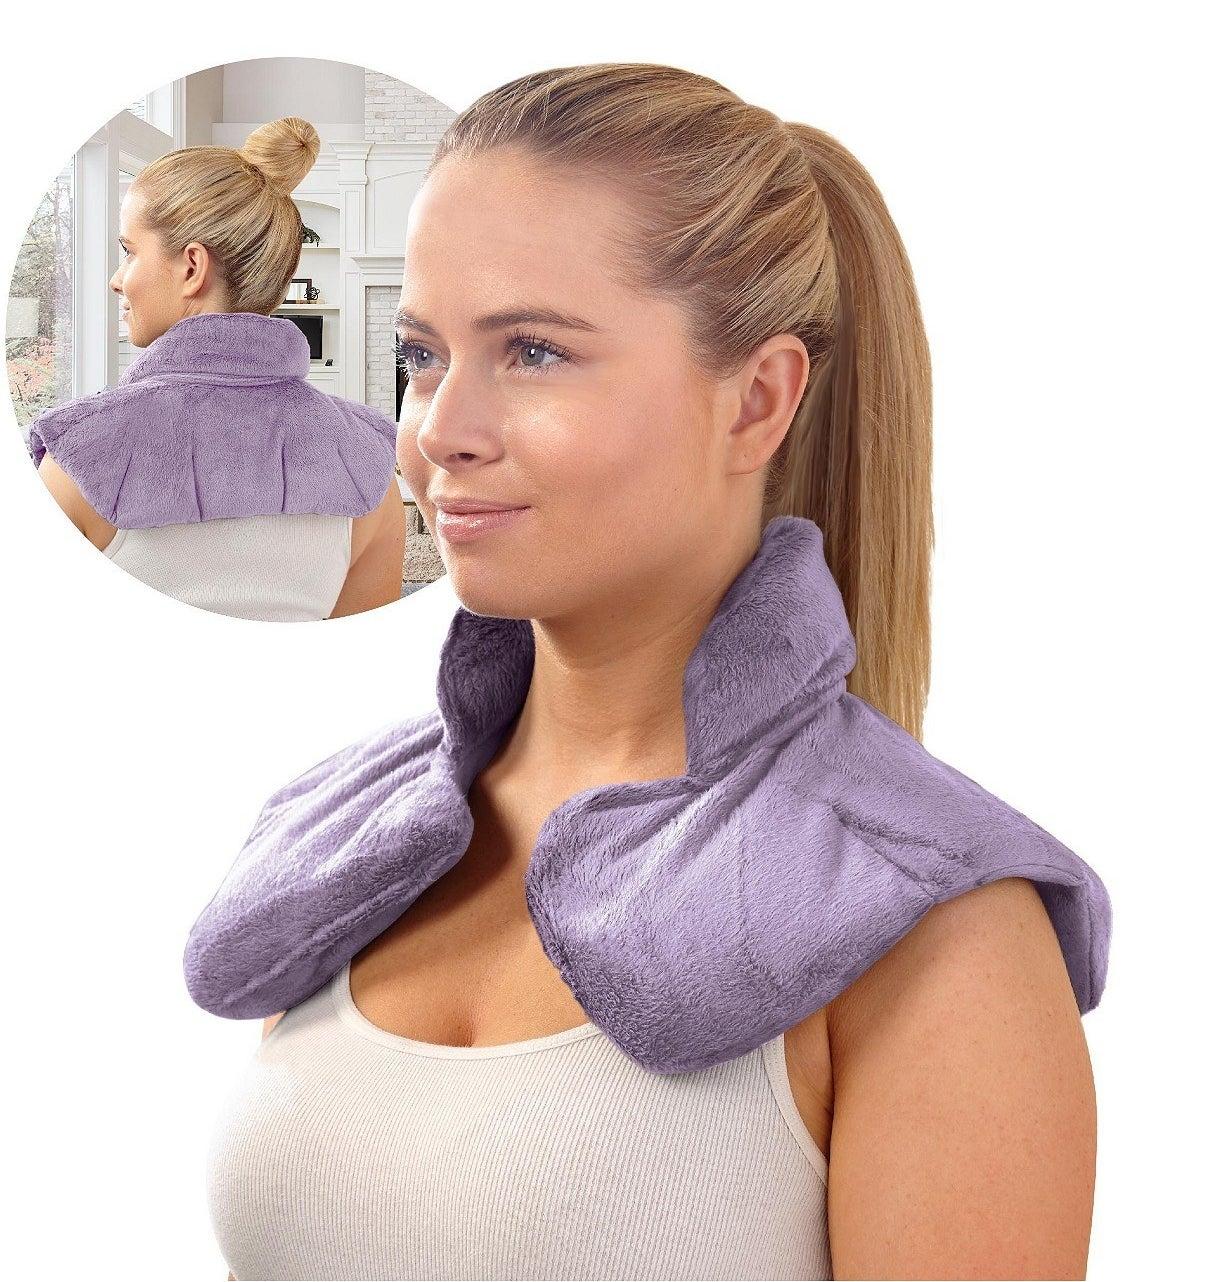 A model using the wrap in purple